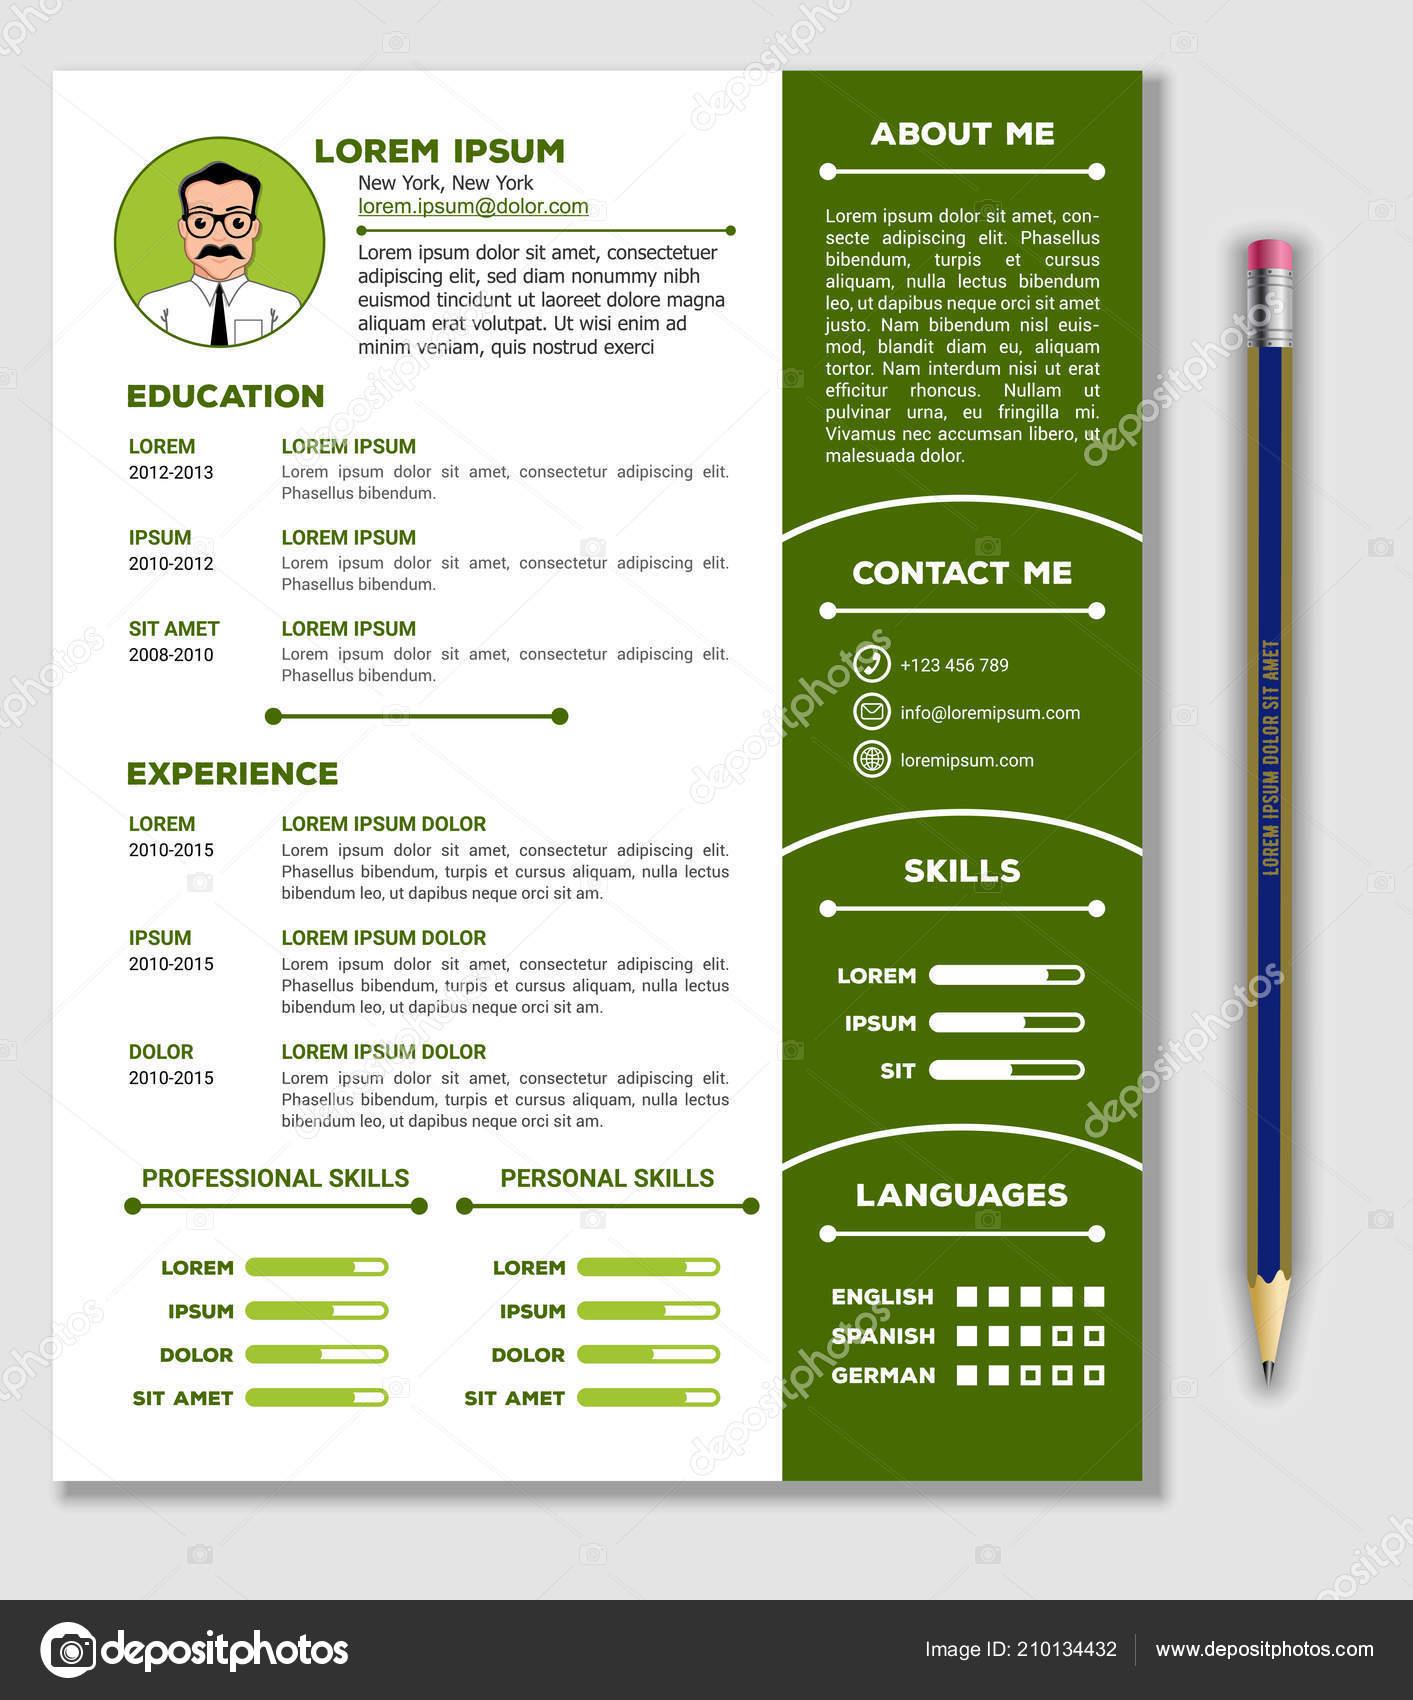 Zivotopis A Zivotopis Vzor S Peknym Minimalistickym Designem A